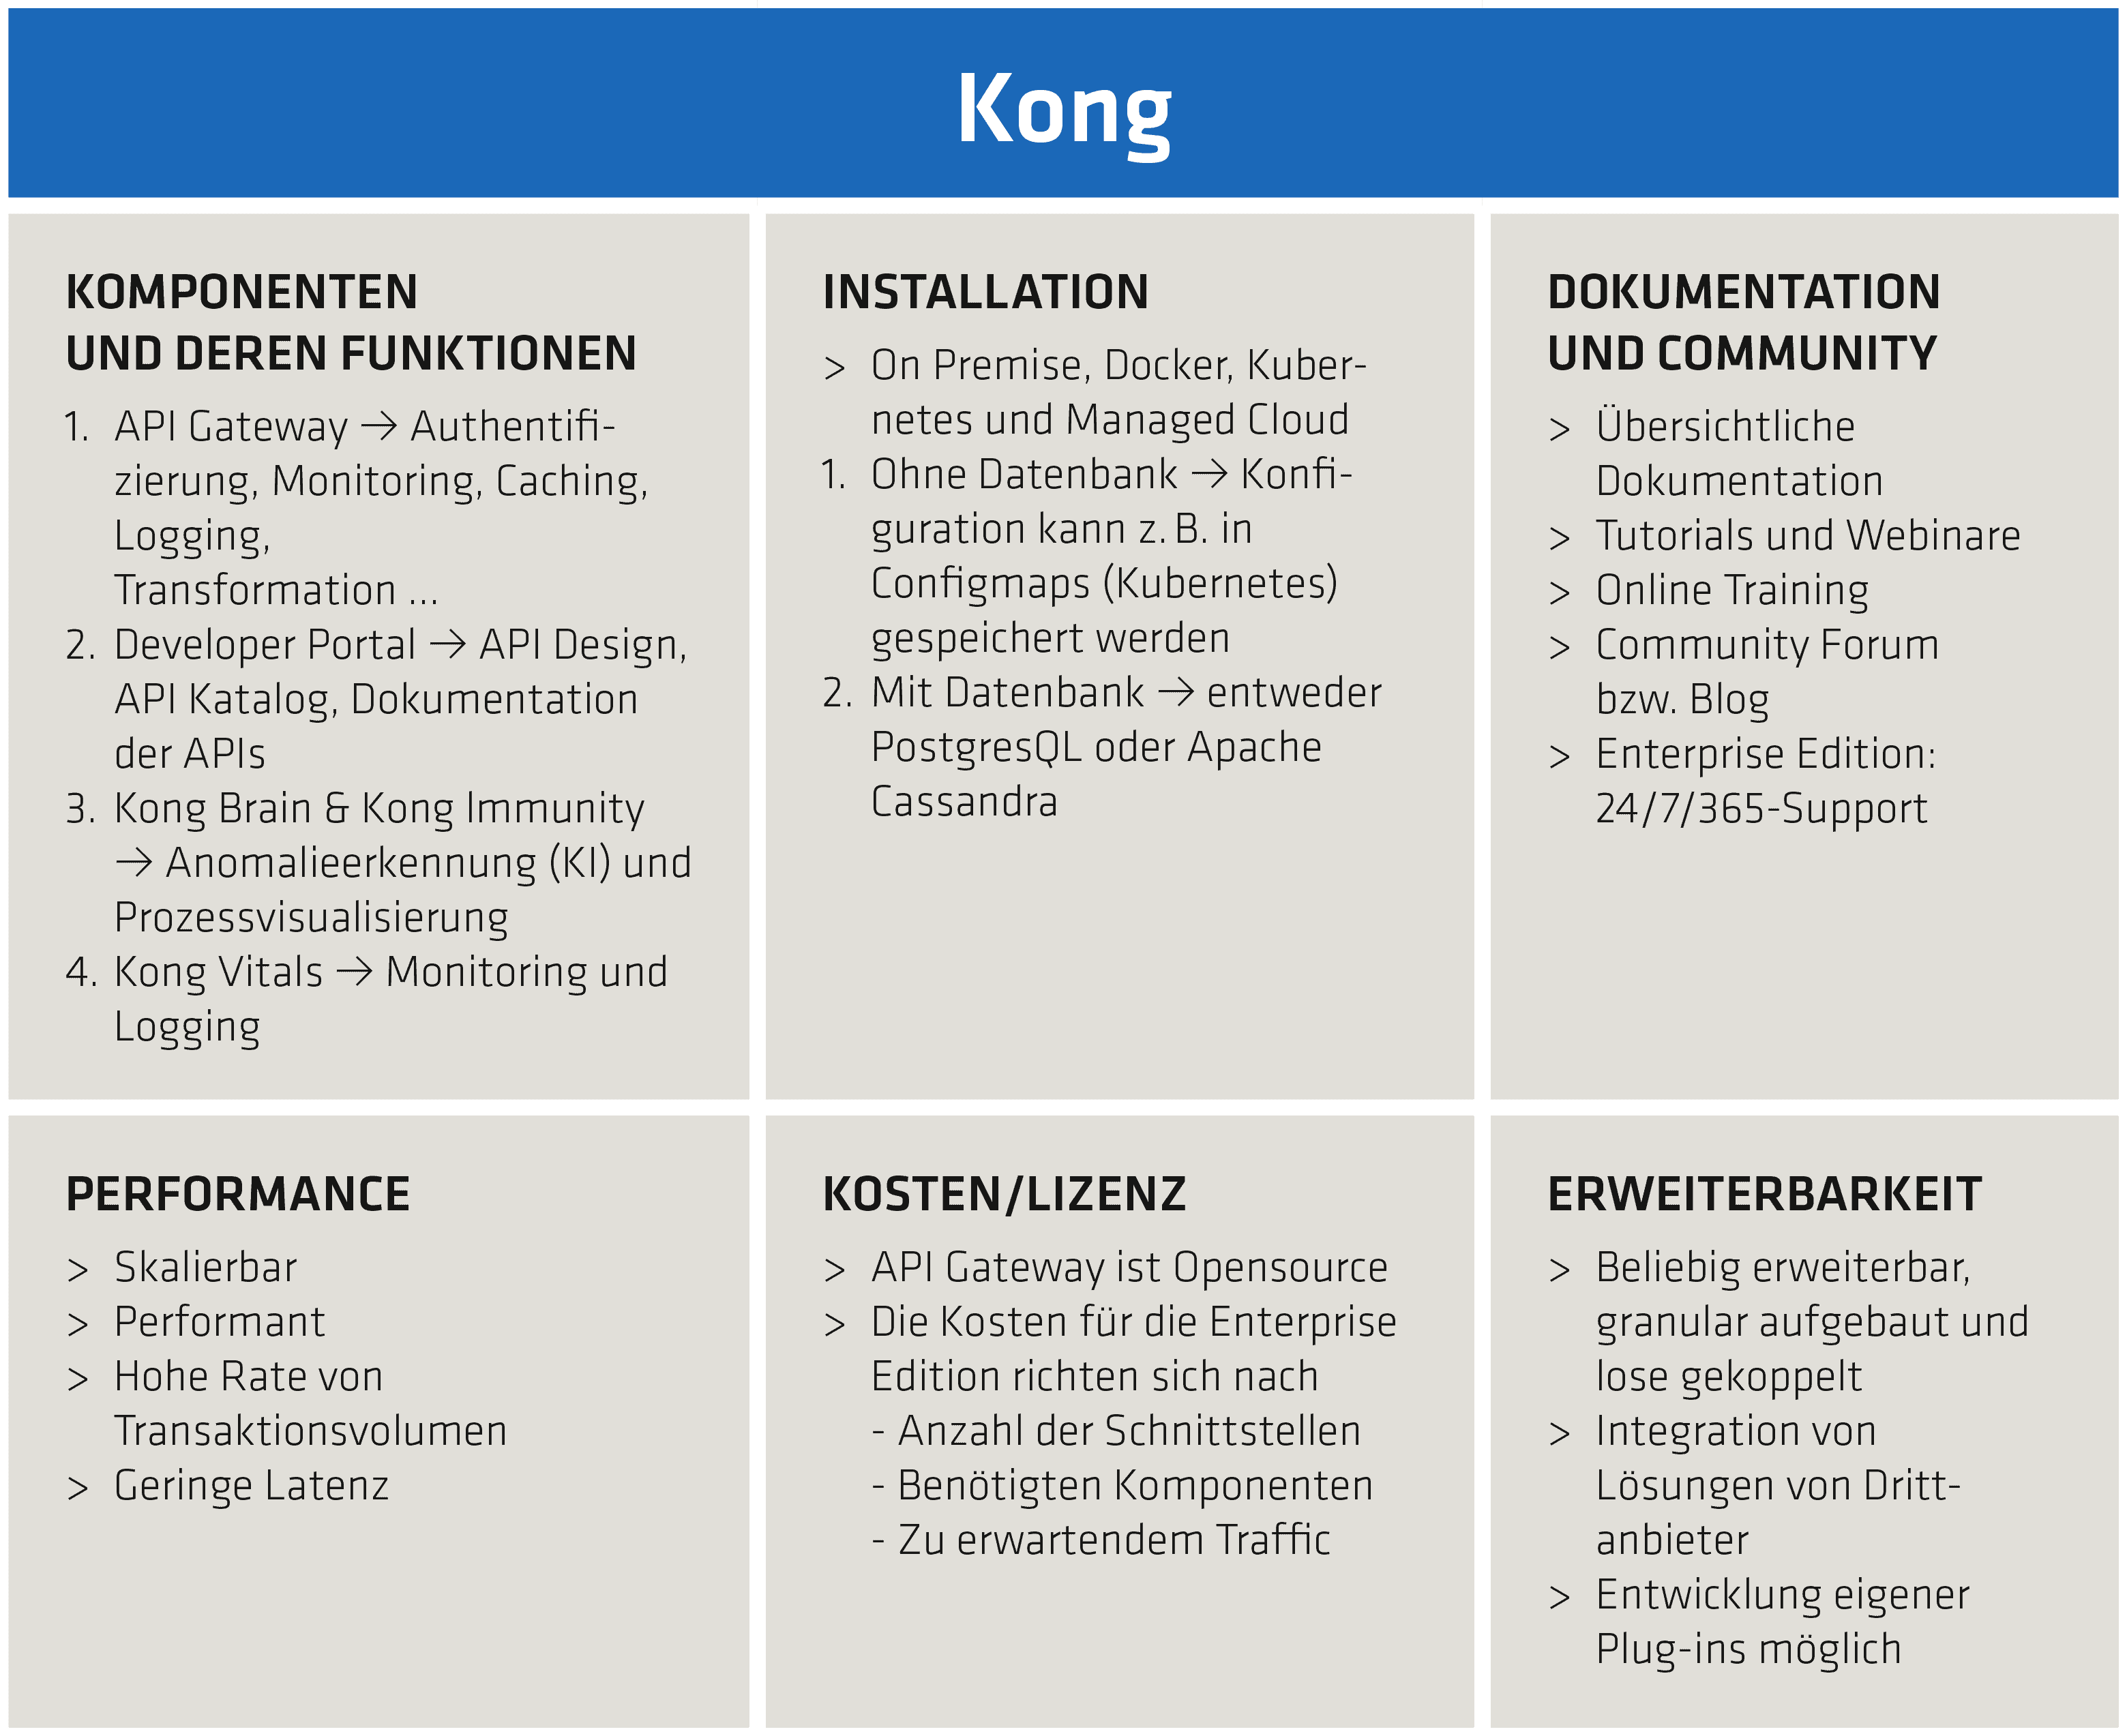 Kong-Bewertungs- und Funktionsmatrix